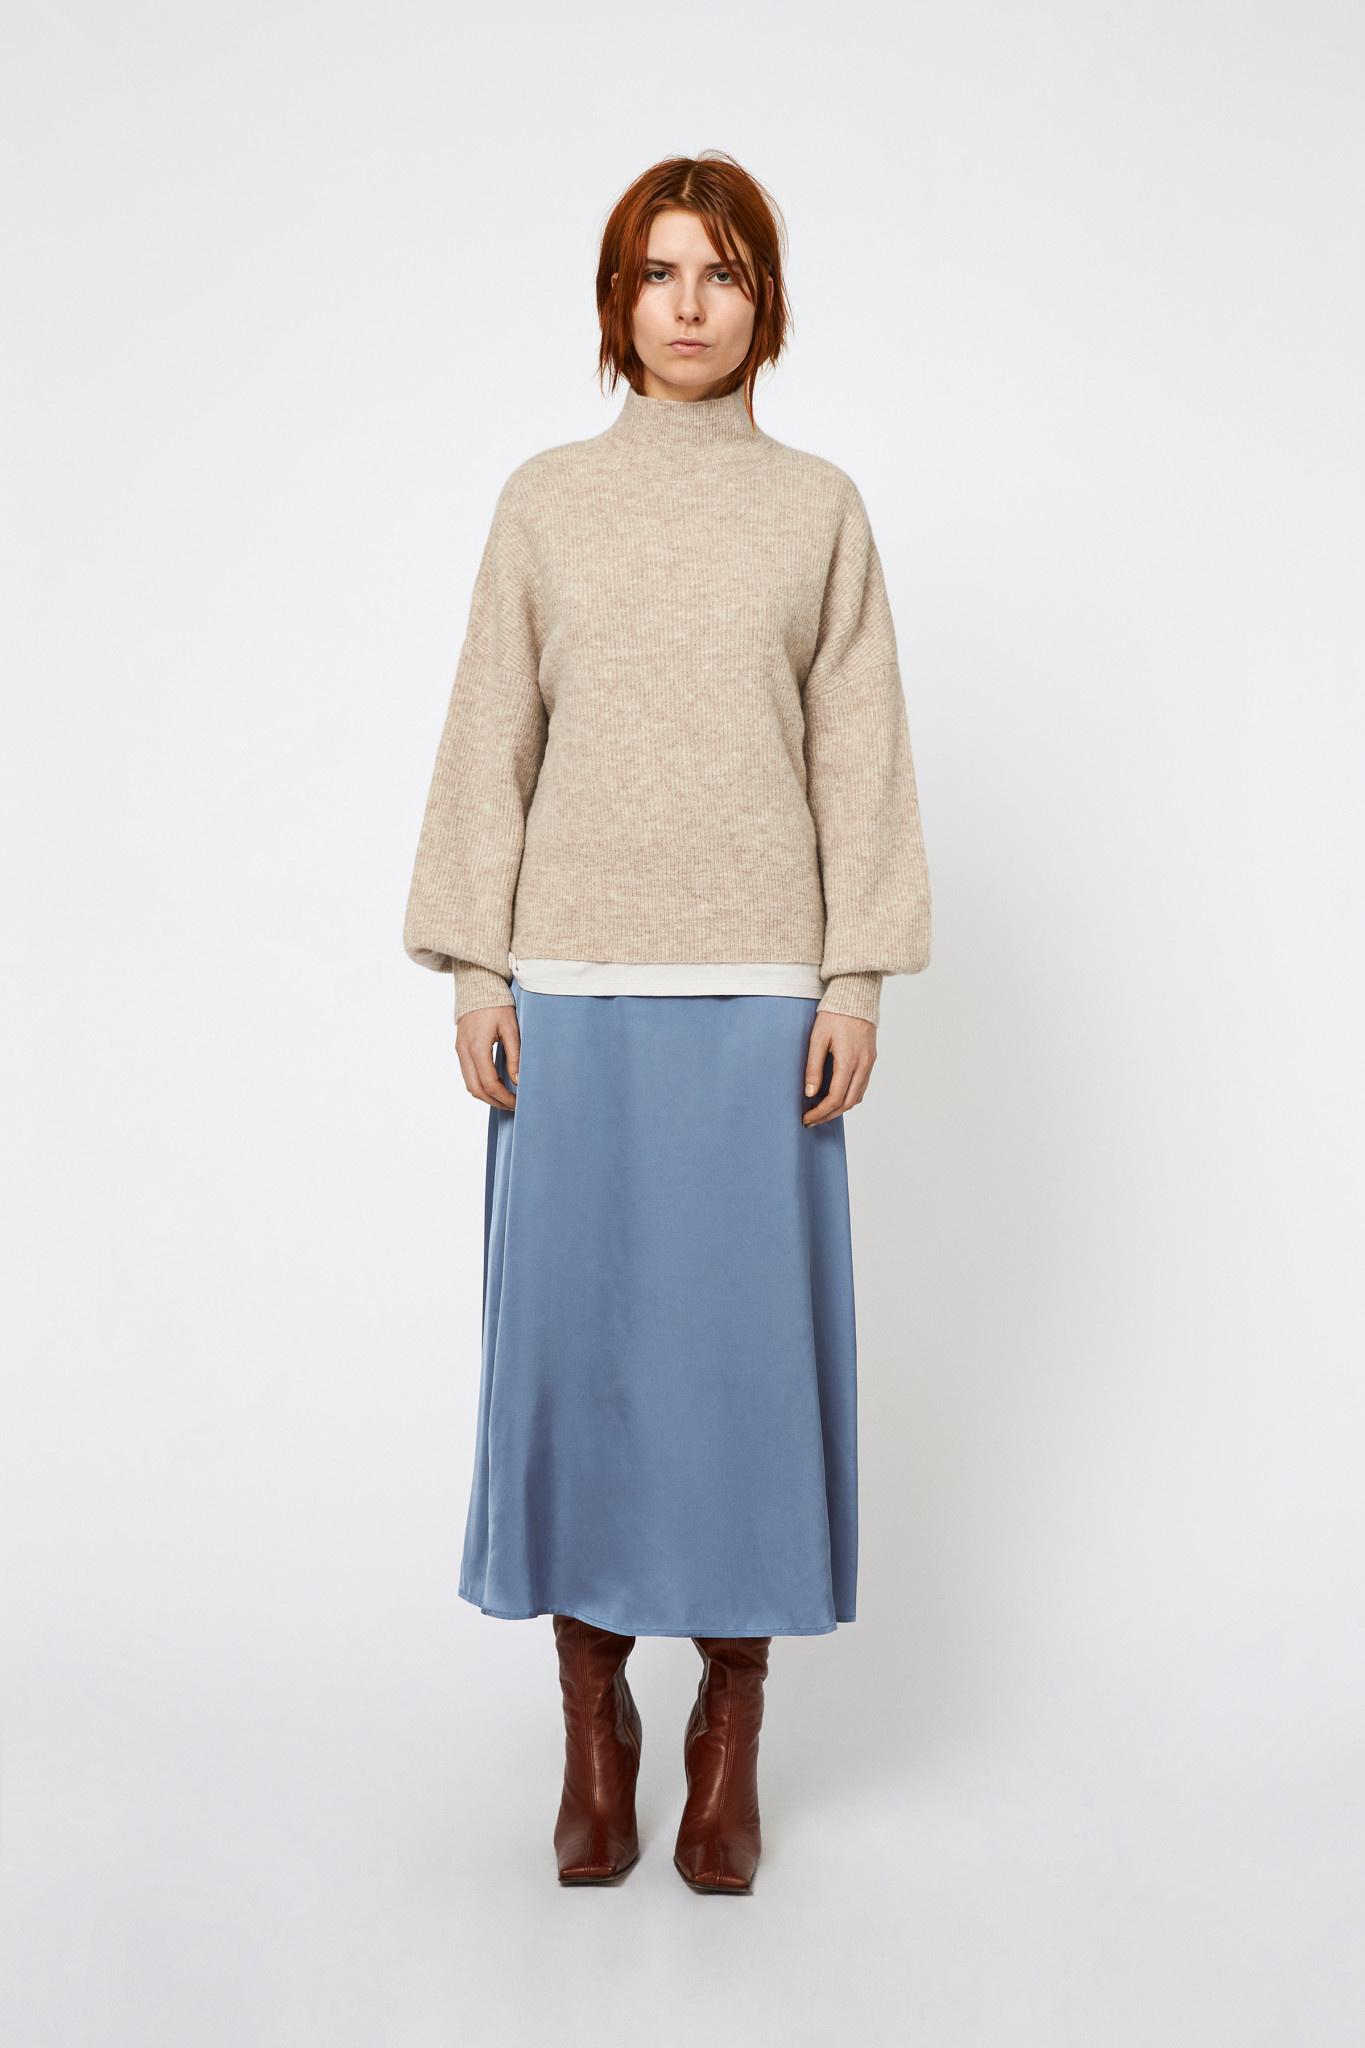 Blakely Knit - Almond-1